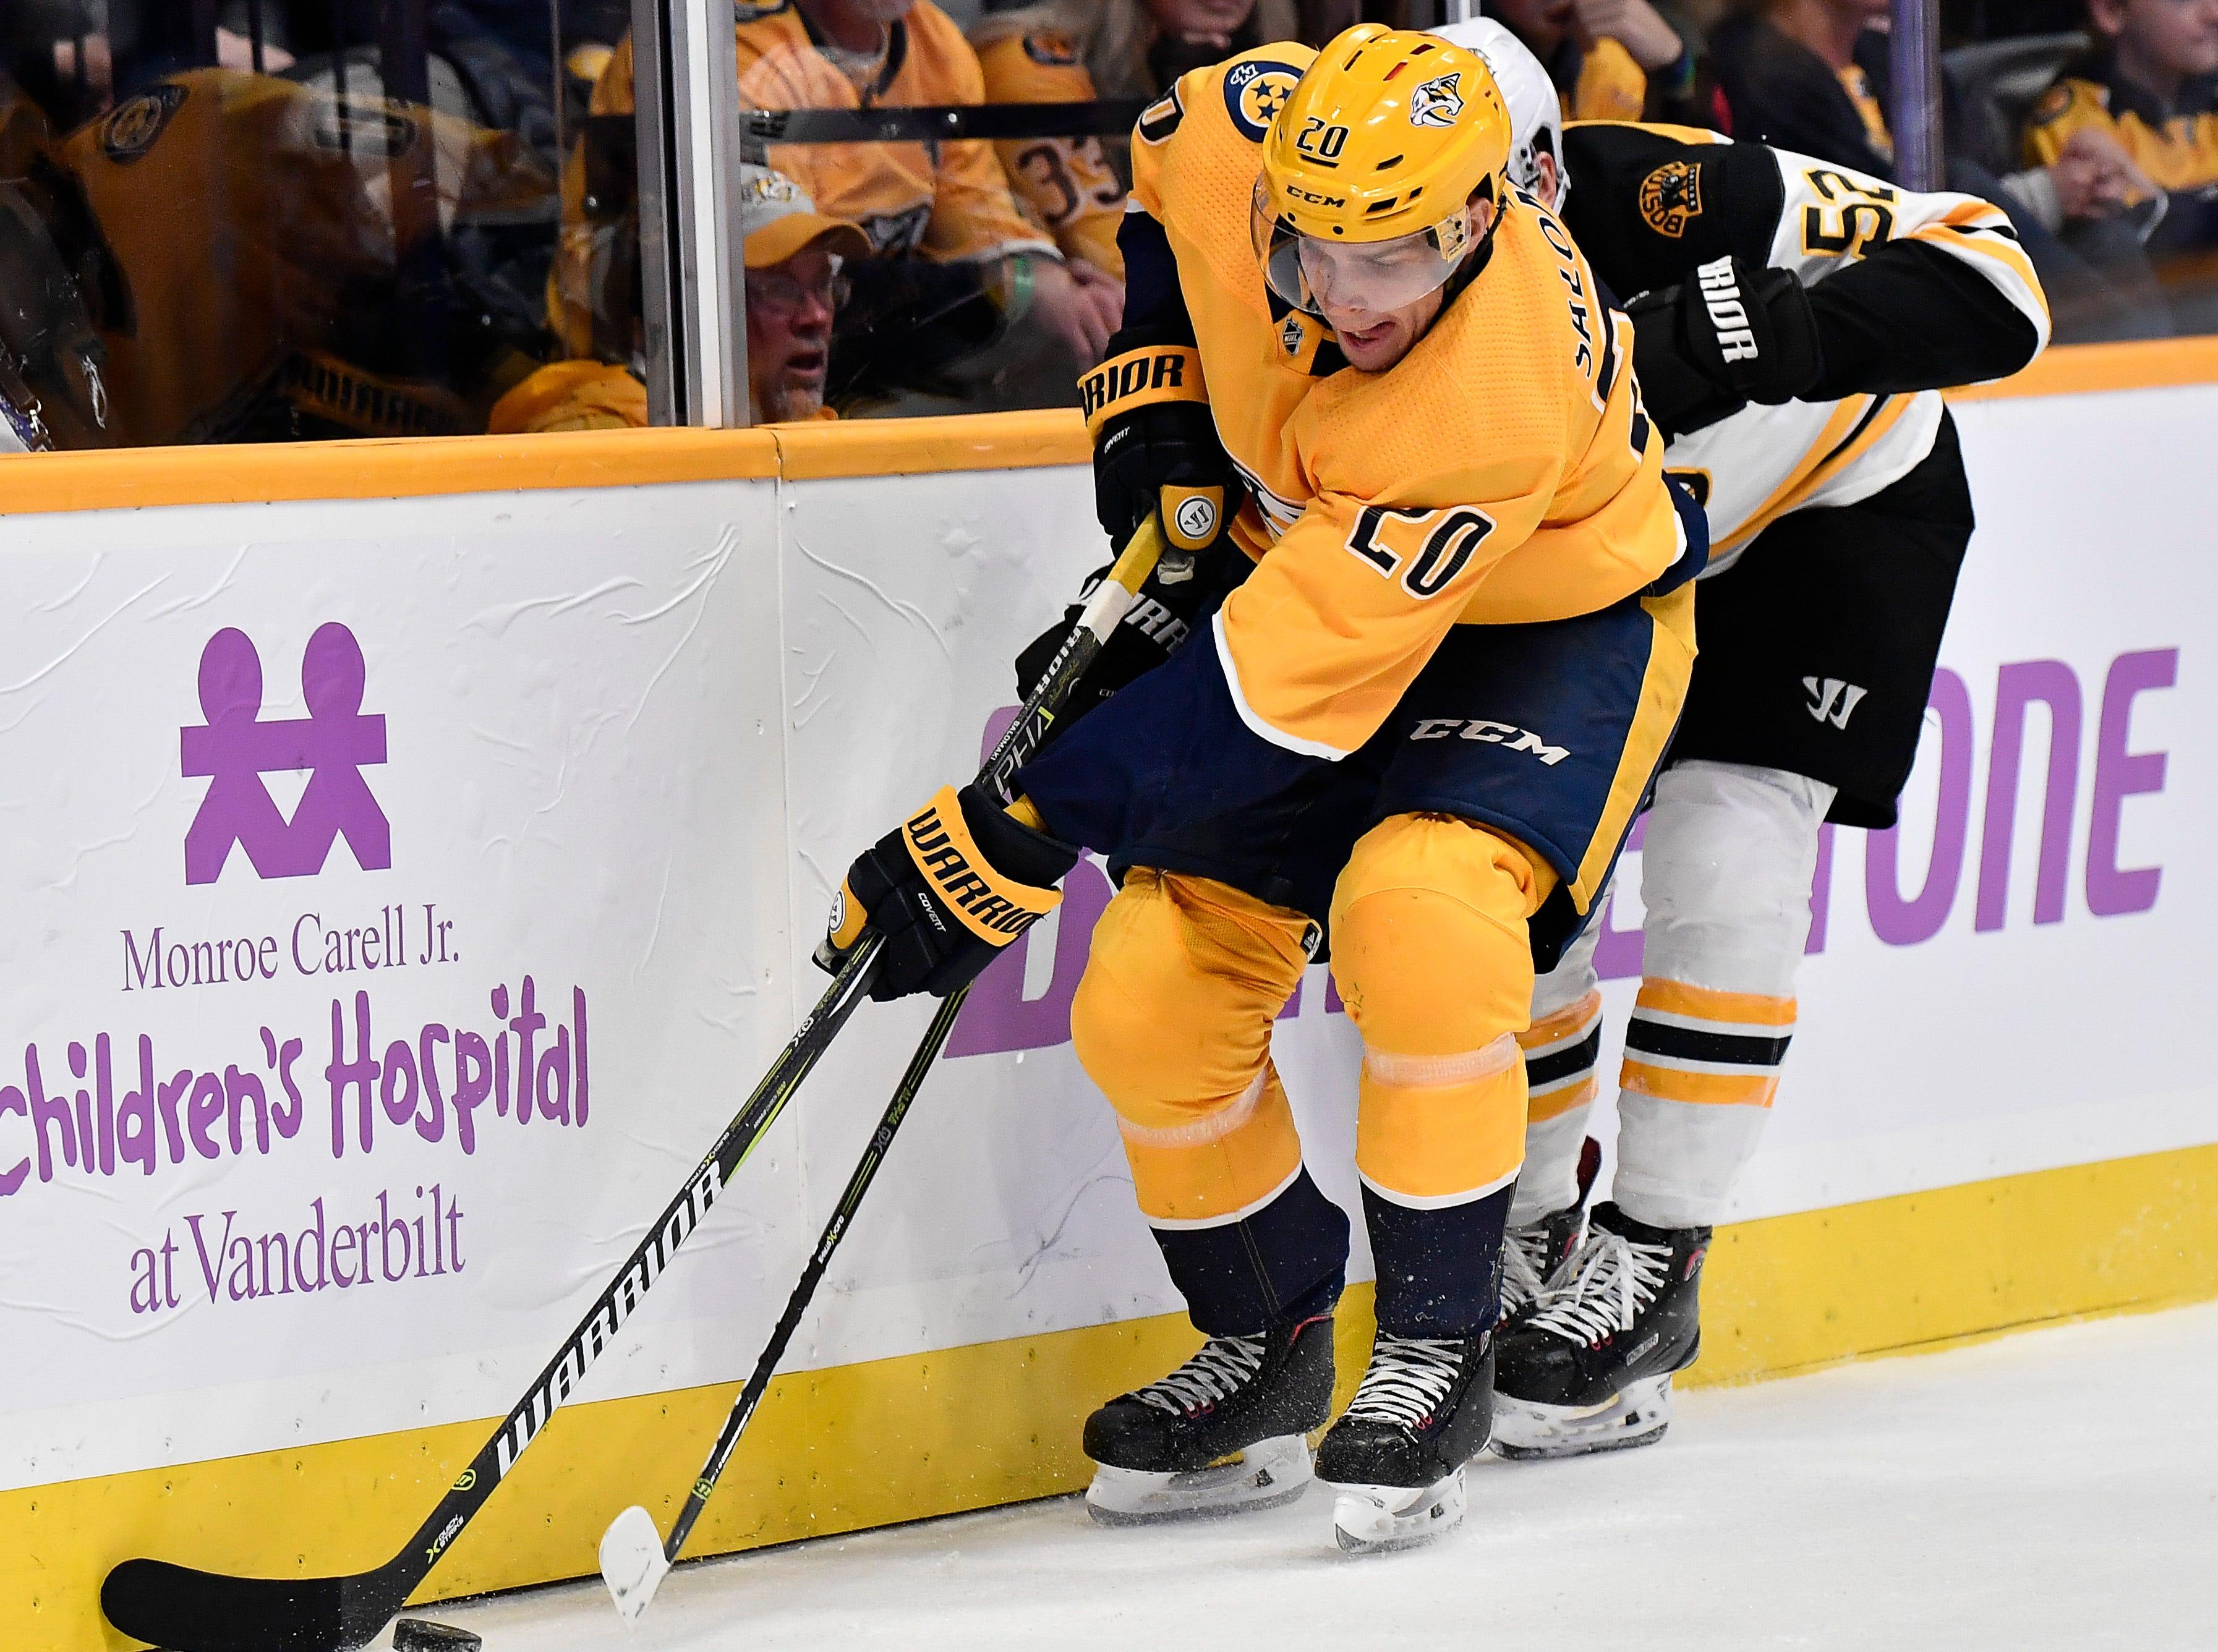 Predators right wing Miikka Salomaki (20) fights for the puck with Bruins center Sean Kuraly (52) during the first period at Bridgestone Arena Saturday, Nov. 3, 2018, in Nashville, Tenn.